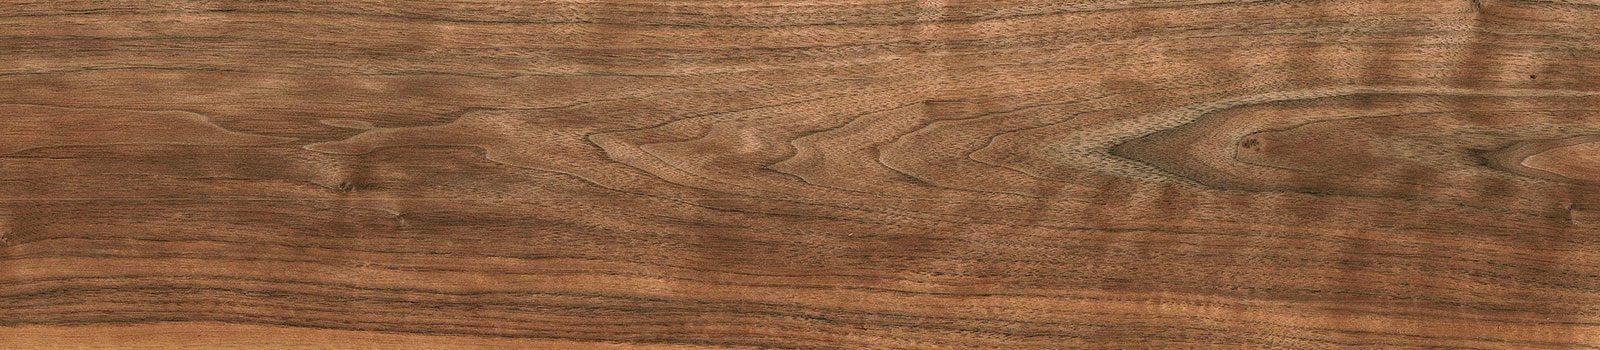 Black American Walnut timber